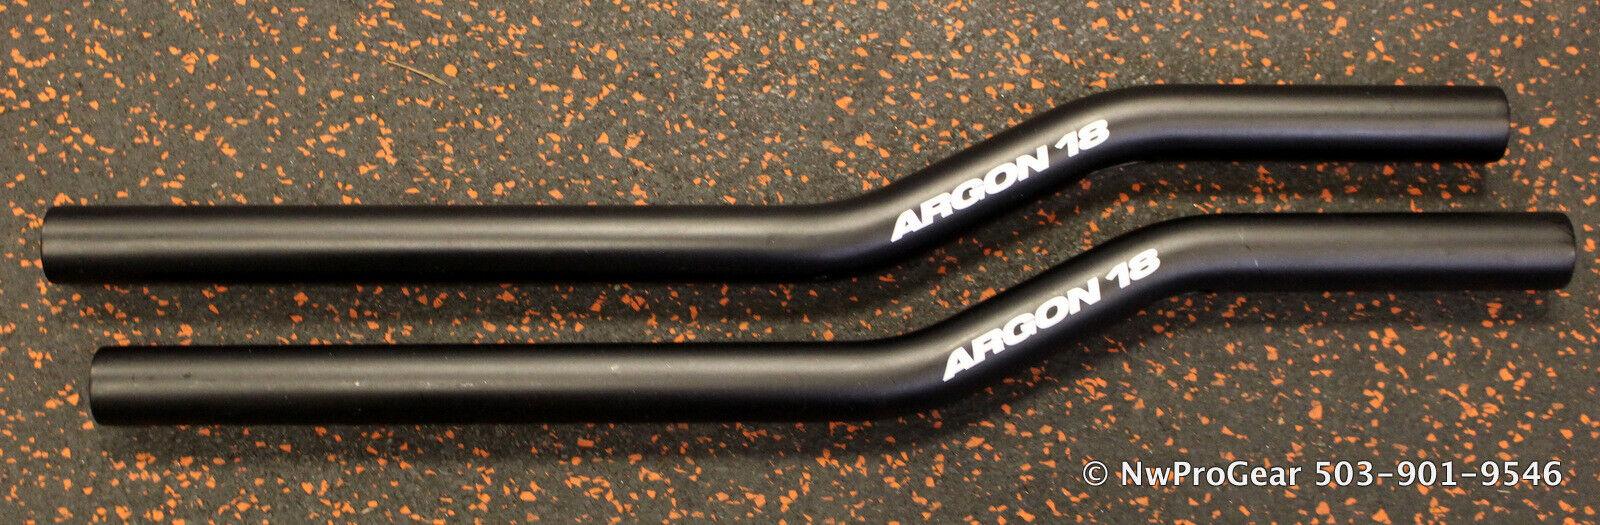 Argon 18 Carbon Aero Bars Extension Time Trial TT Triathlon